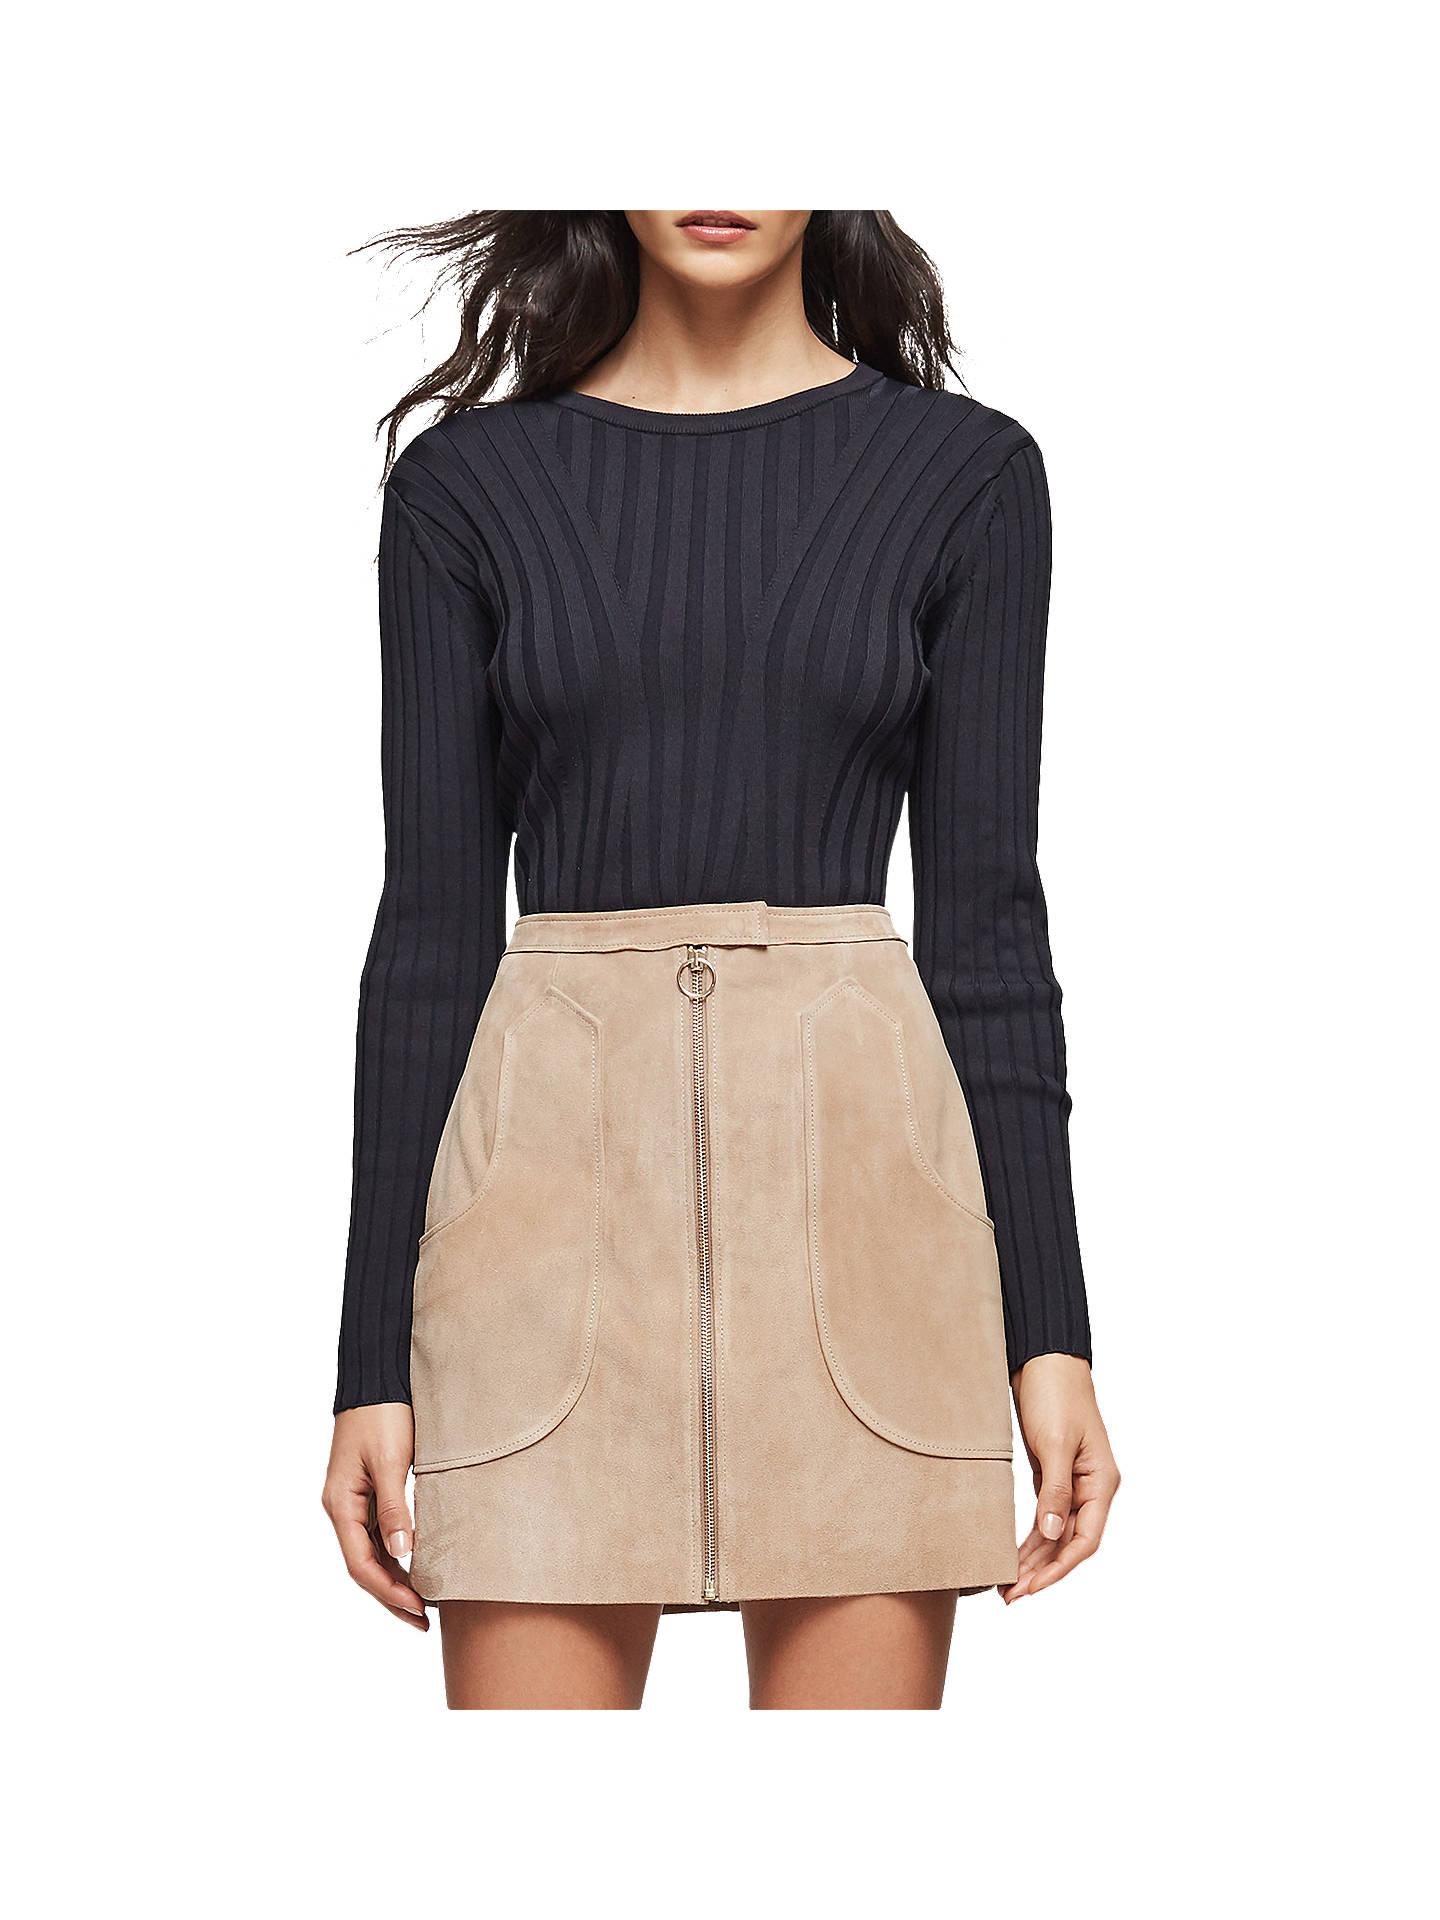 a0a69d9e7 Buy Reiss Keaton Suede Mini Skirt, Sand, 6 Online at johnlewis.com ...